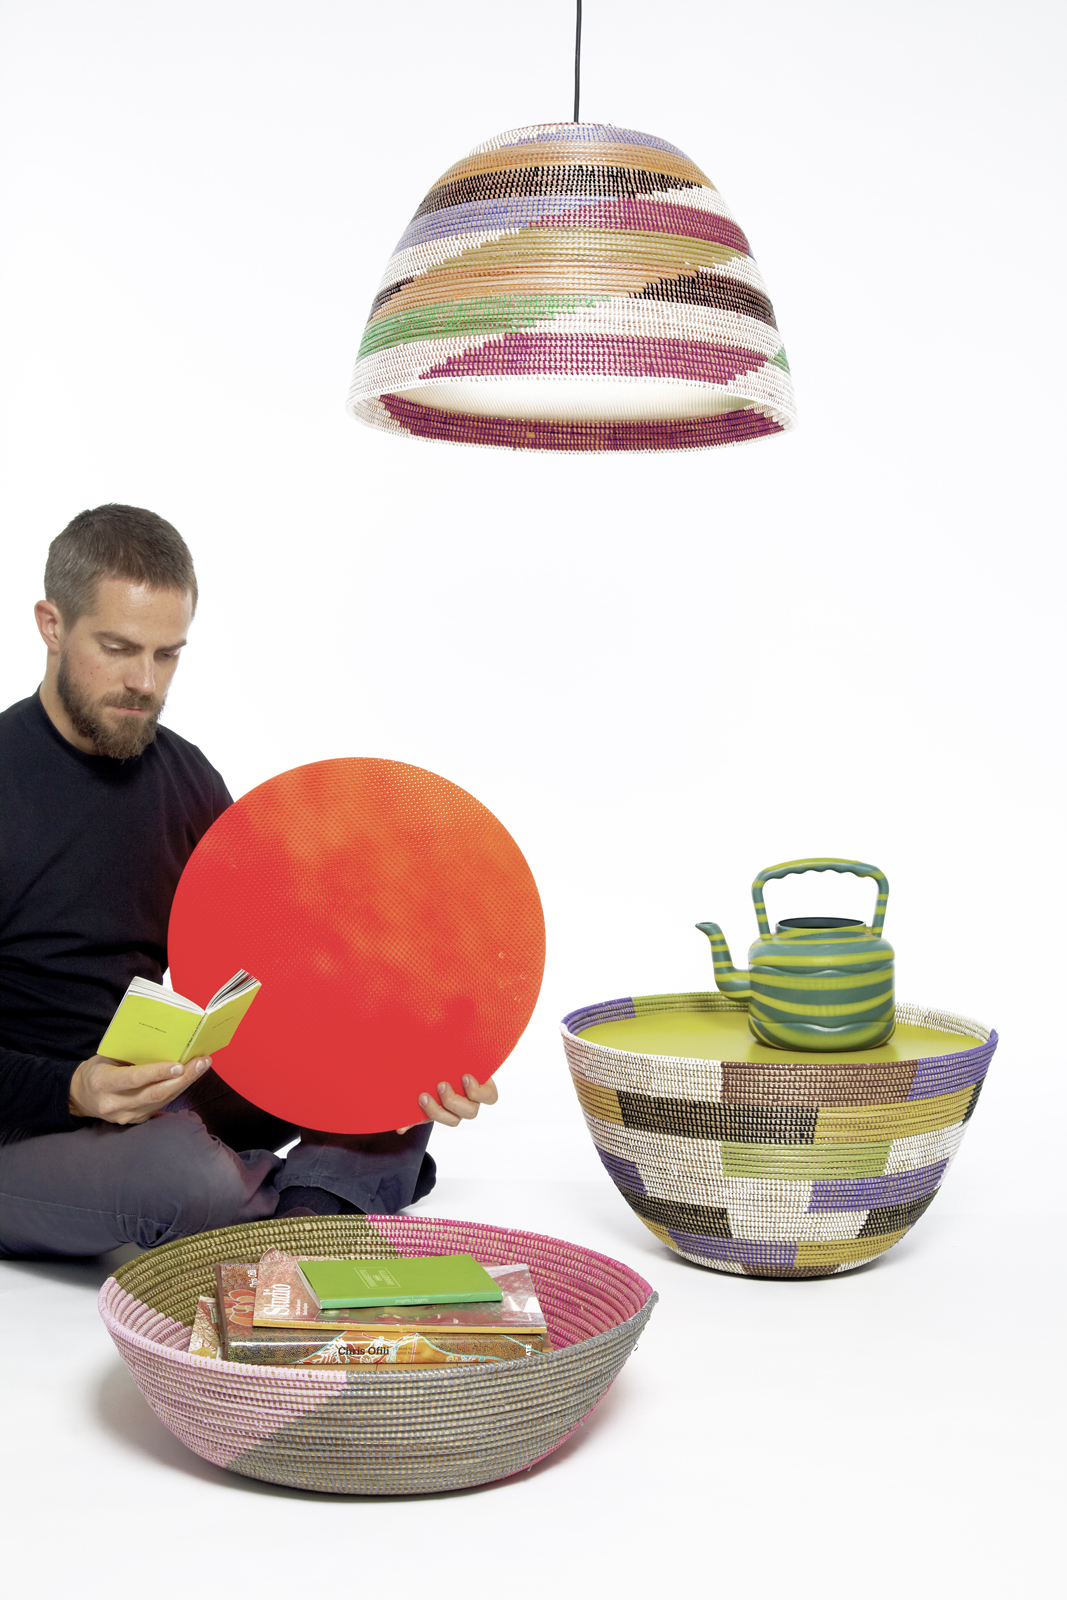 Stephen Burks, <i>Single Basket Lamps & Basket Tables with Daniel</i>, 2010. Photo by Daniel Hakansson.